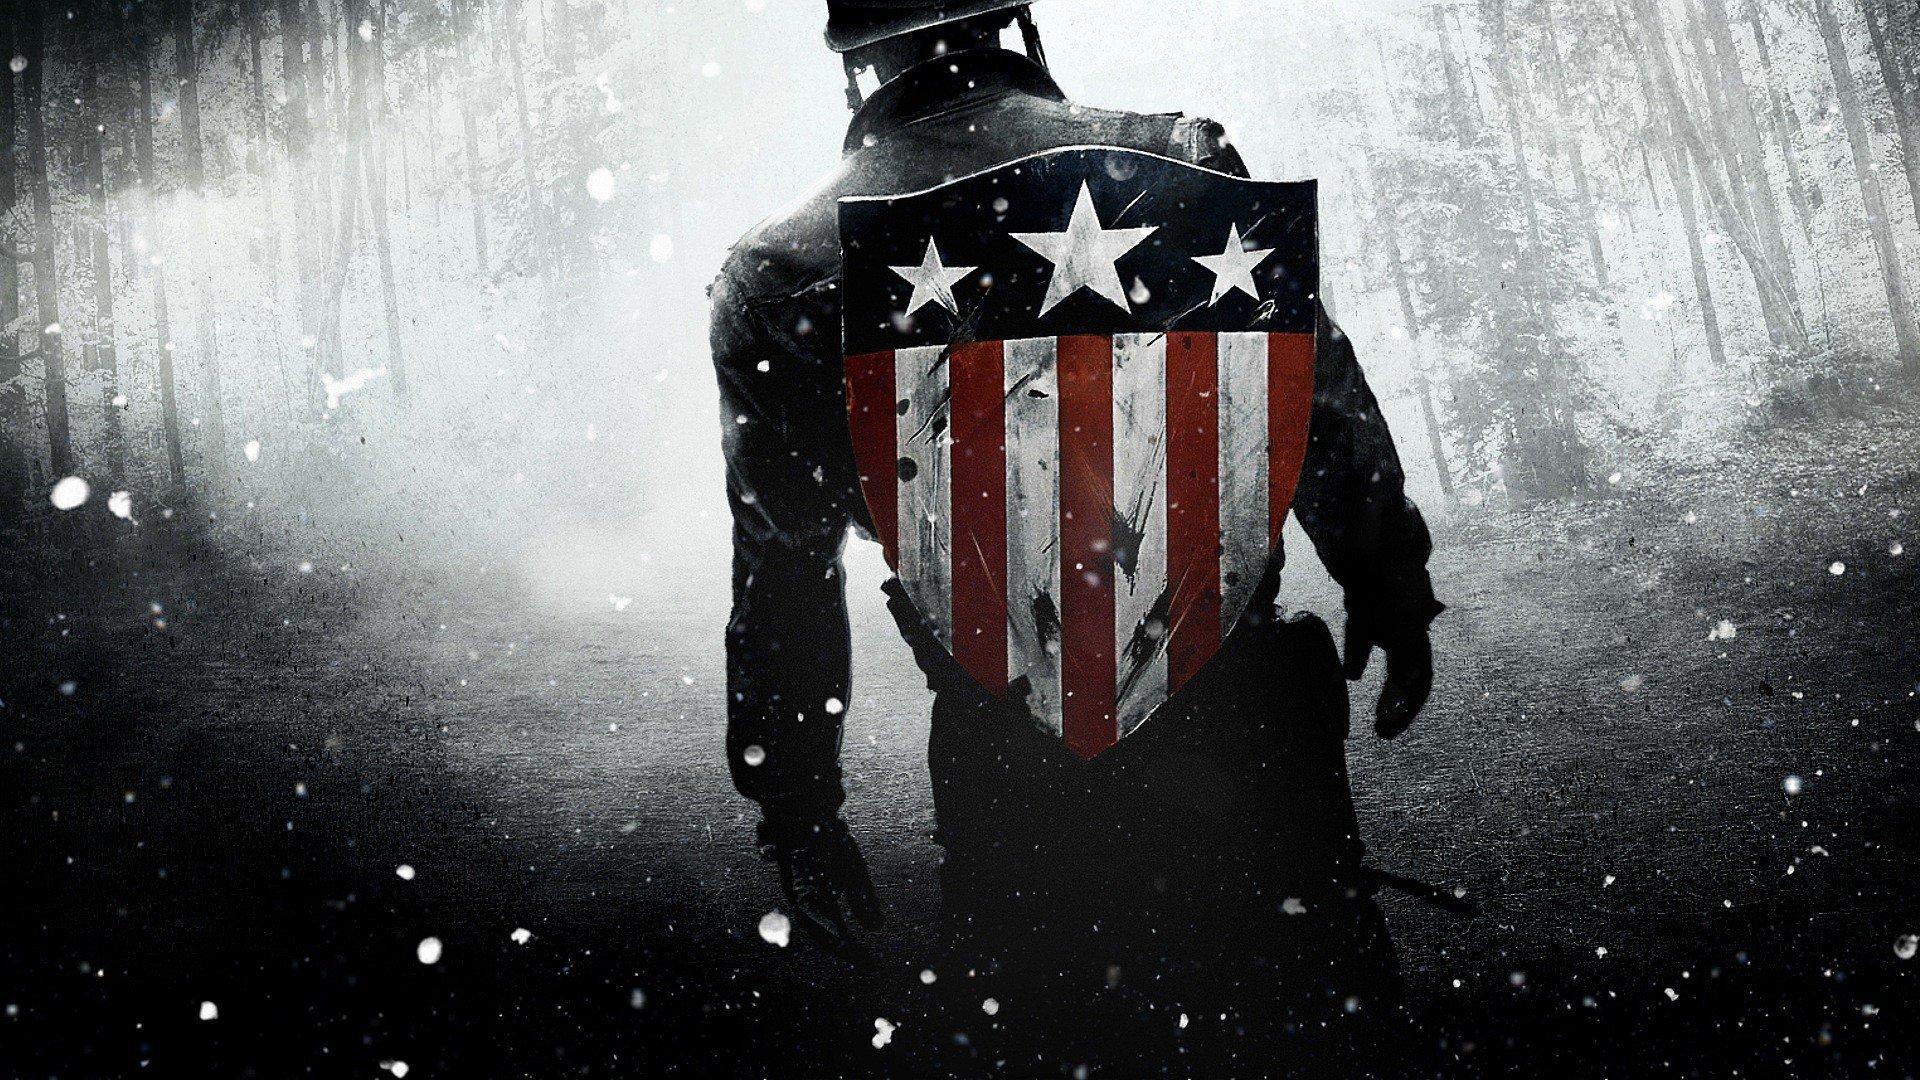 Captain America The First Avenger HD Wallpaper